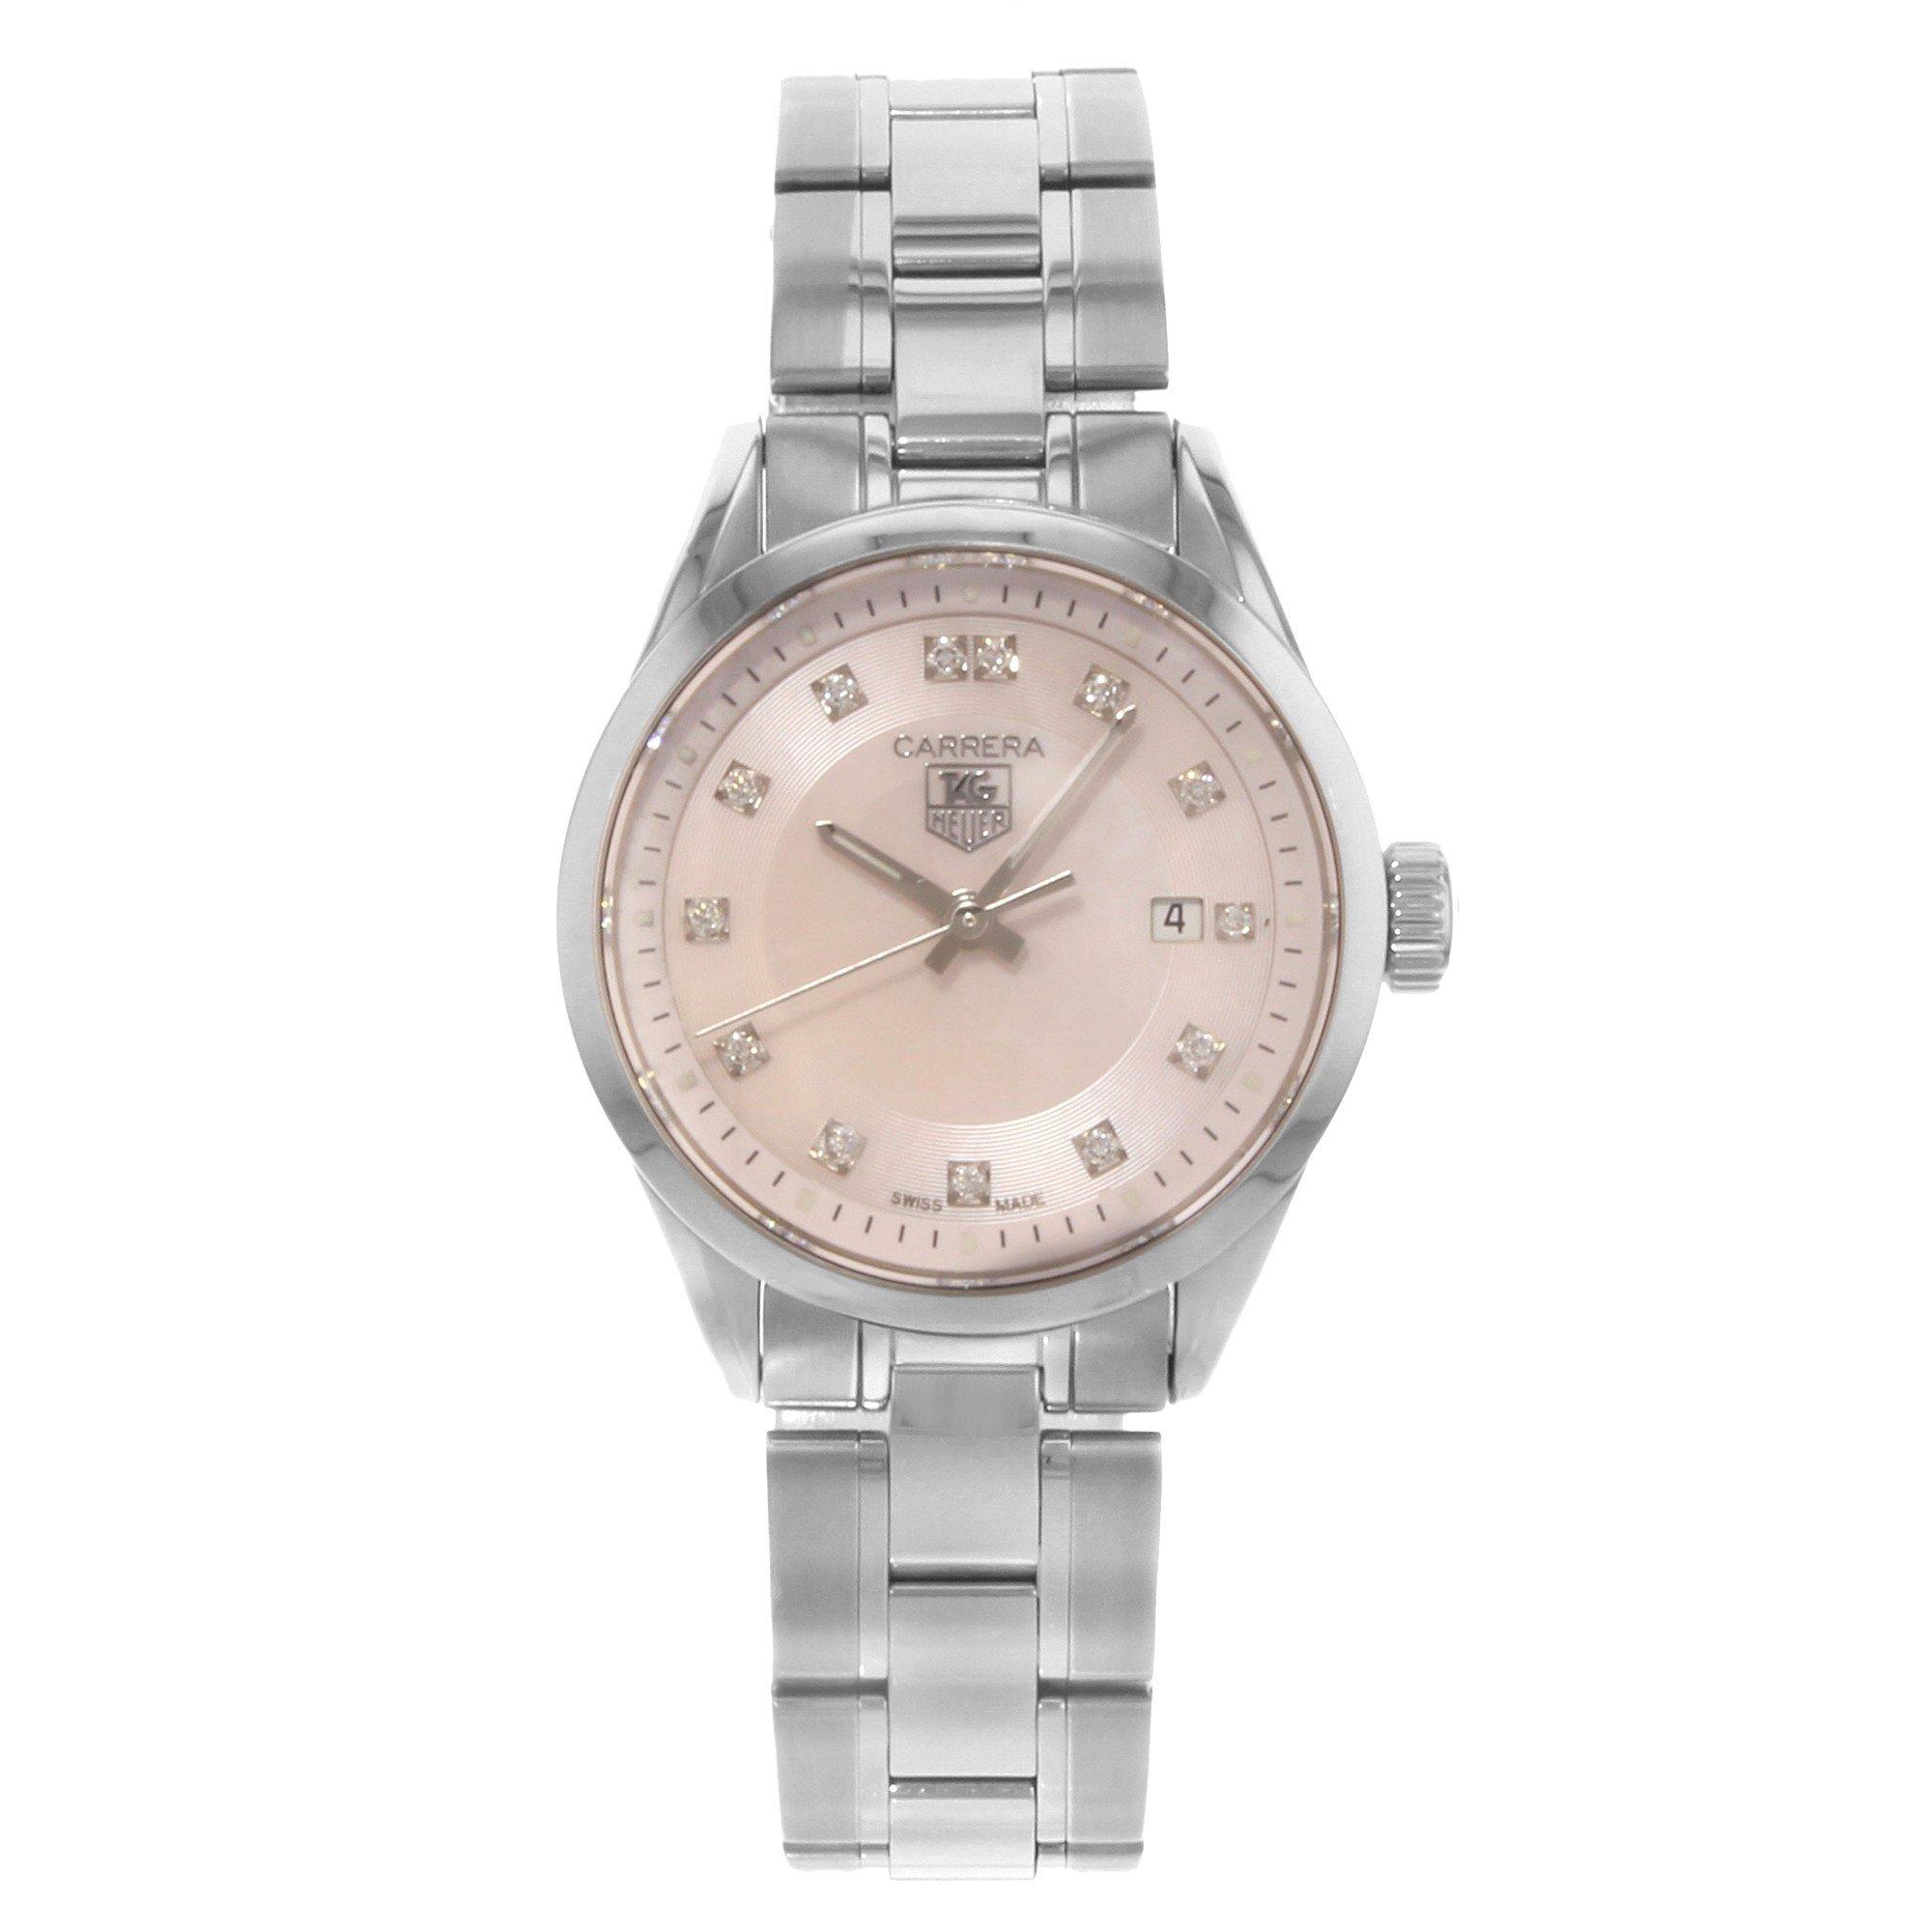 Tag Heuer Carrera quartz womens Watch WV1417.BA0793 (Certified Pre-owned)